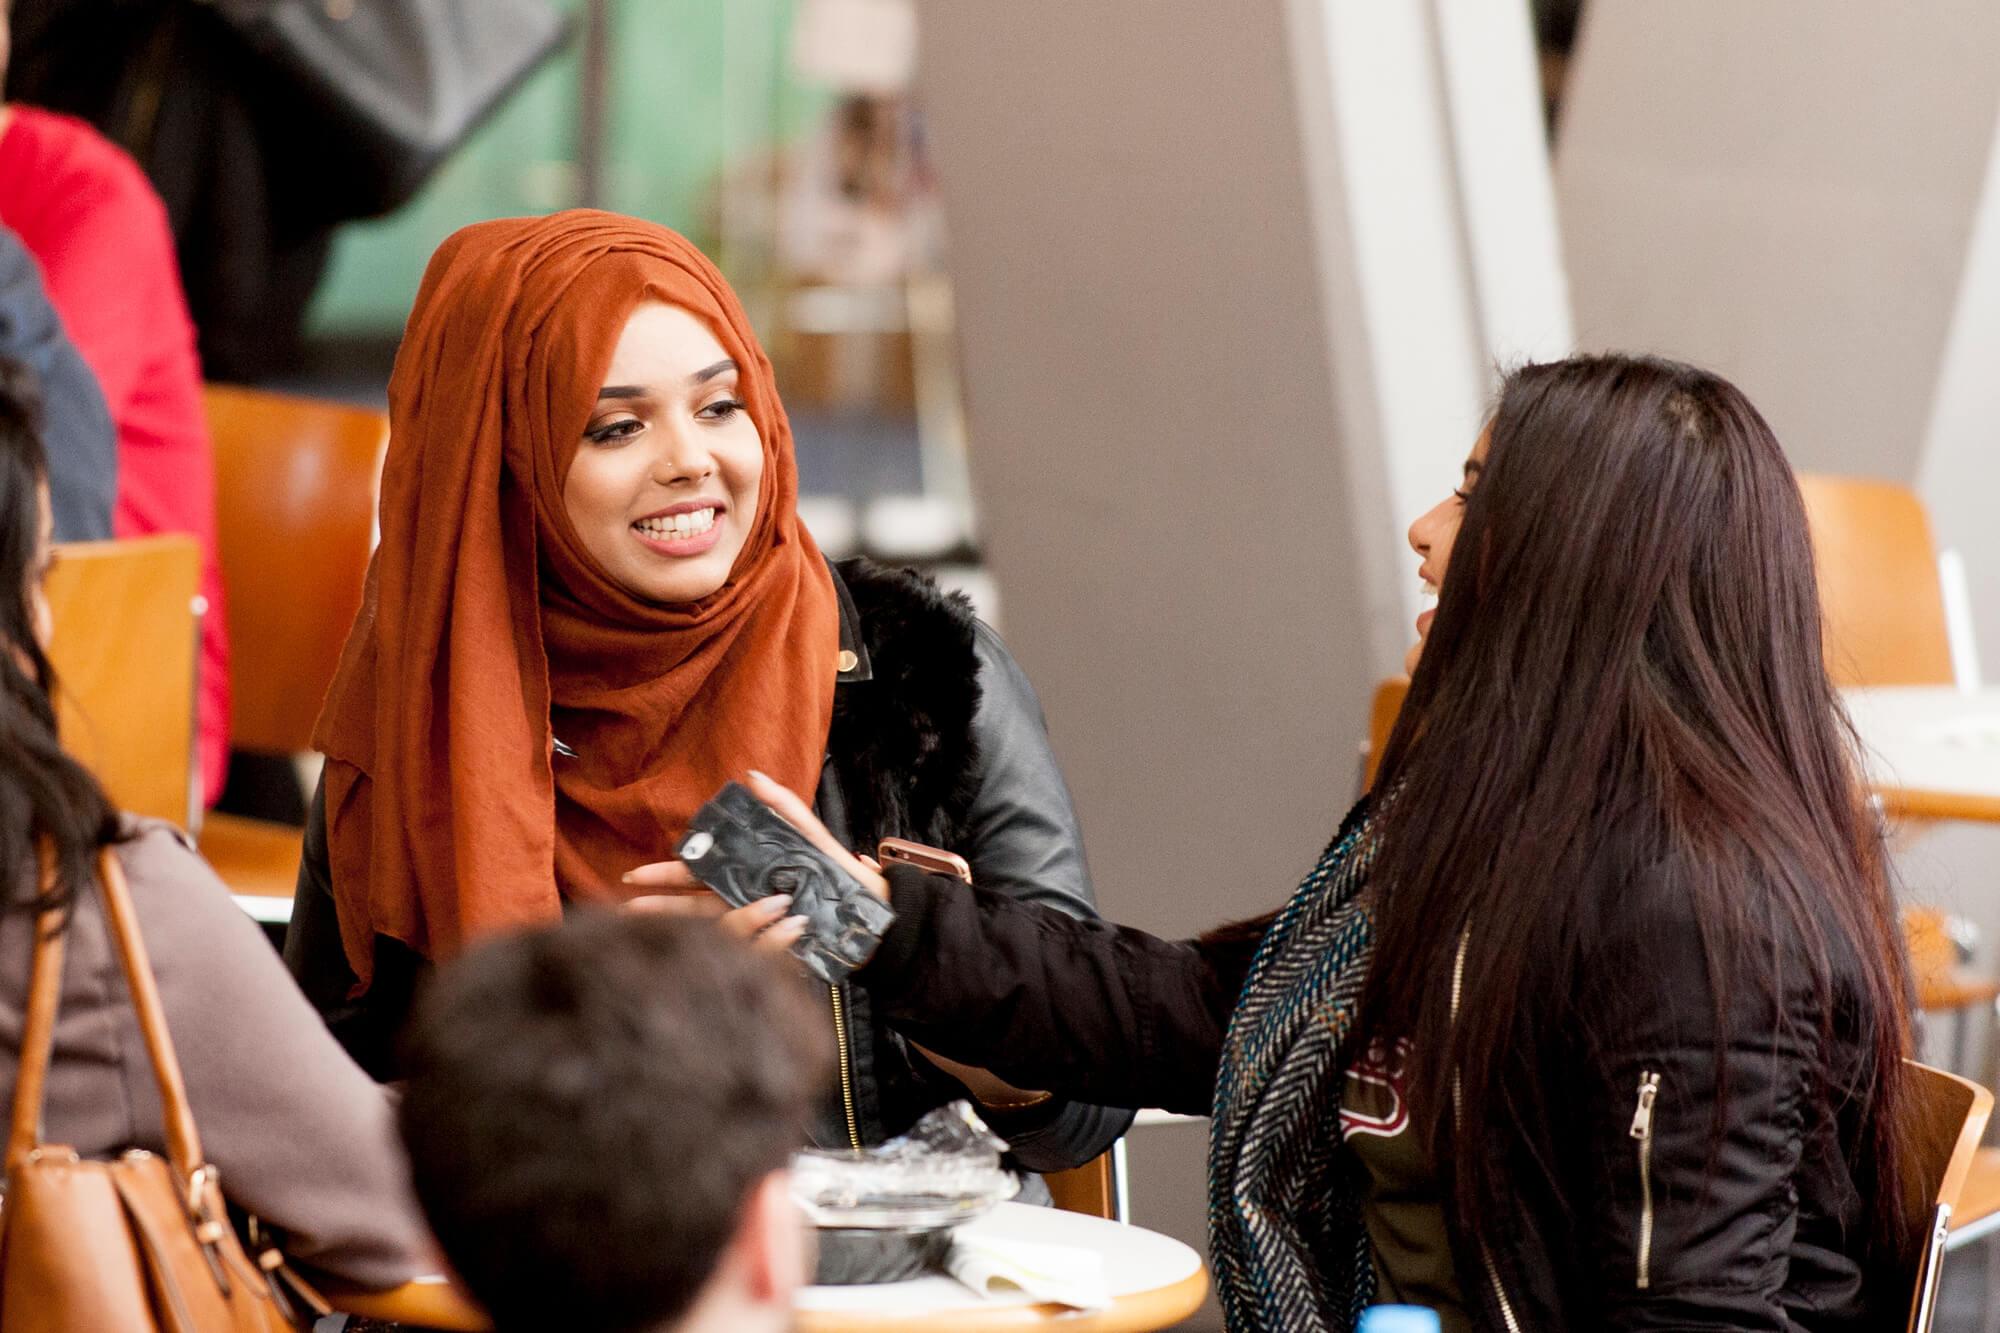 Students socialising